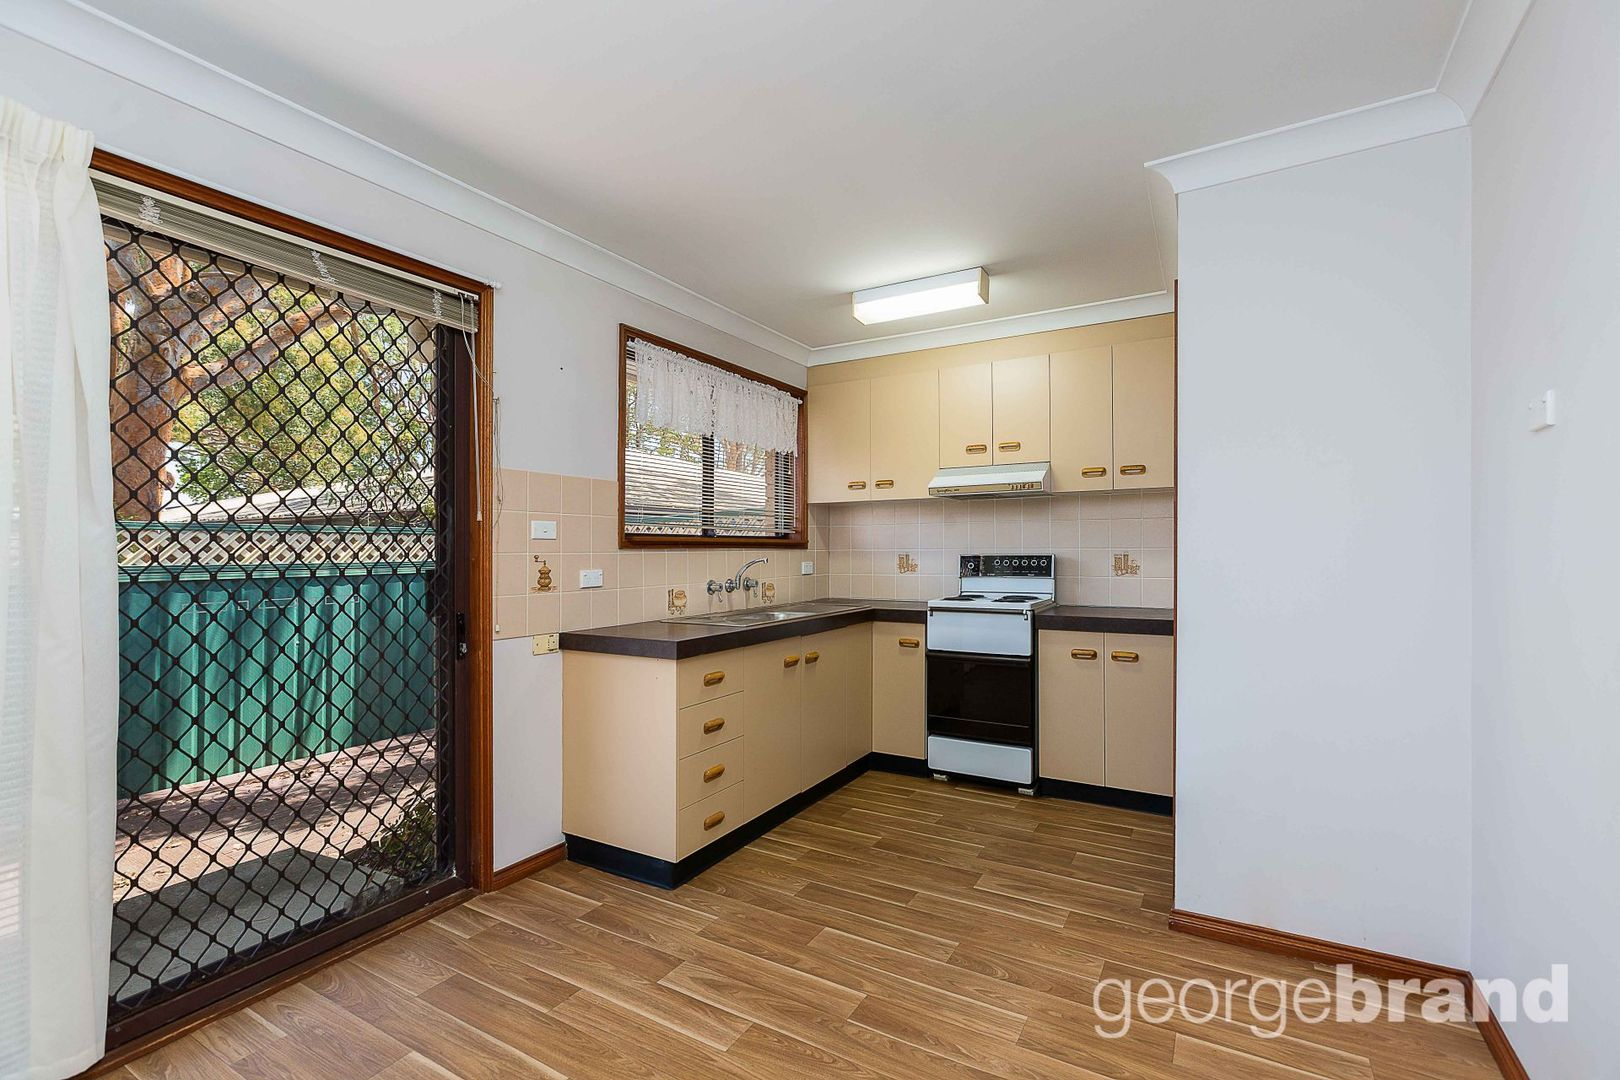 16/255 Main Road, Toukley NSW 2263, Image 2